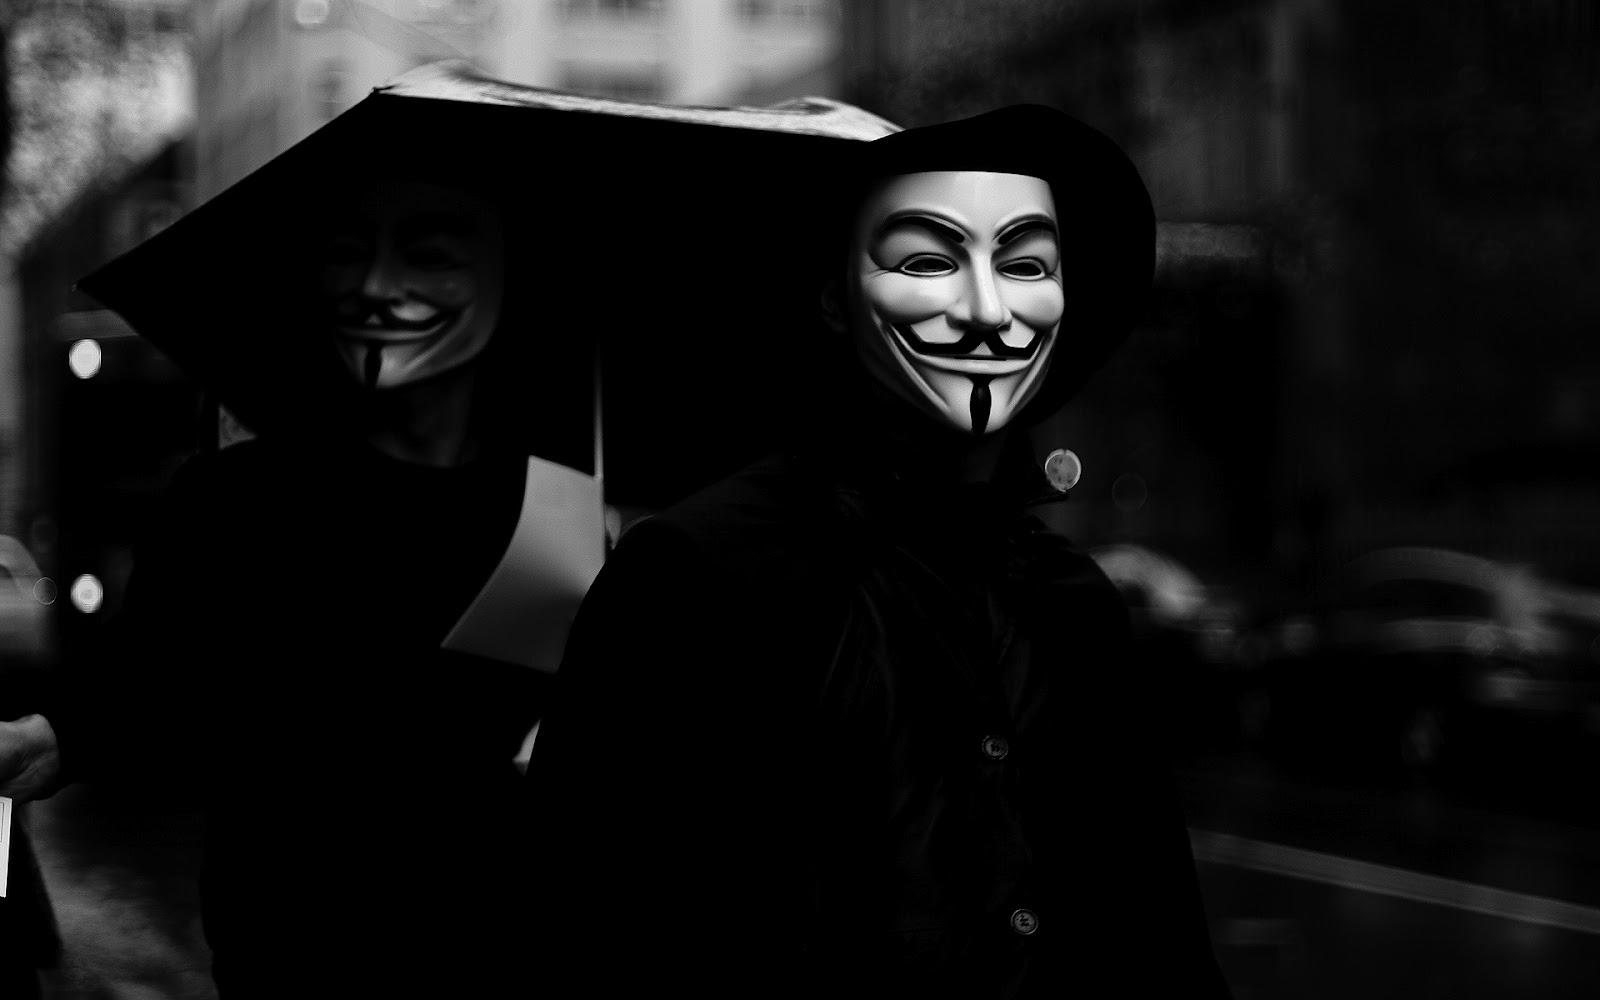 http://1.bp.blogspot.com/-_VACRKCJBzk/T2pZQxYt_SI/AAAAAAAAAdw/Le7vz8P8RFw/s1600/anonymous%20wallpaper%20guy%20fawkes.jpg